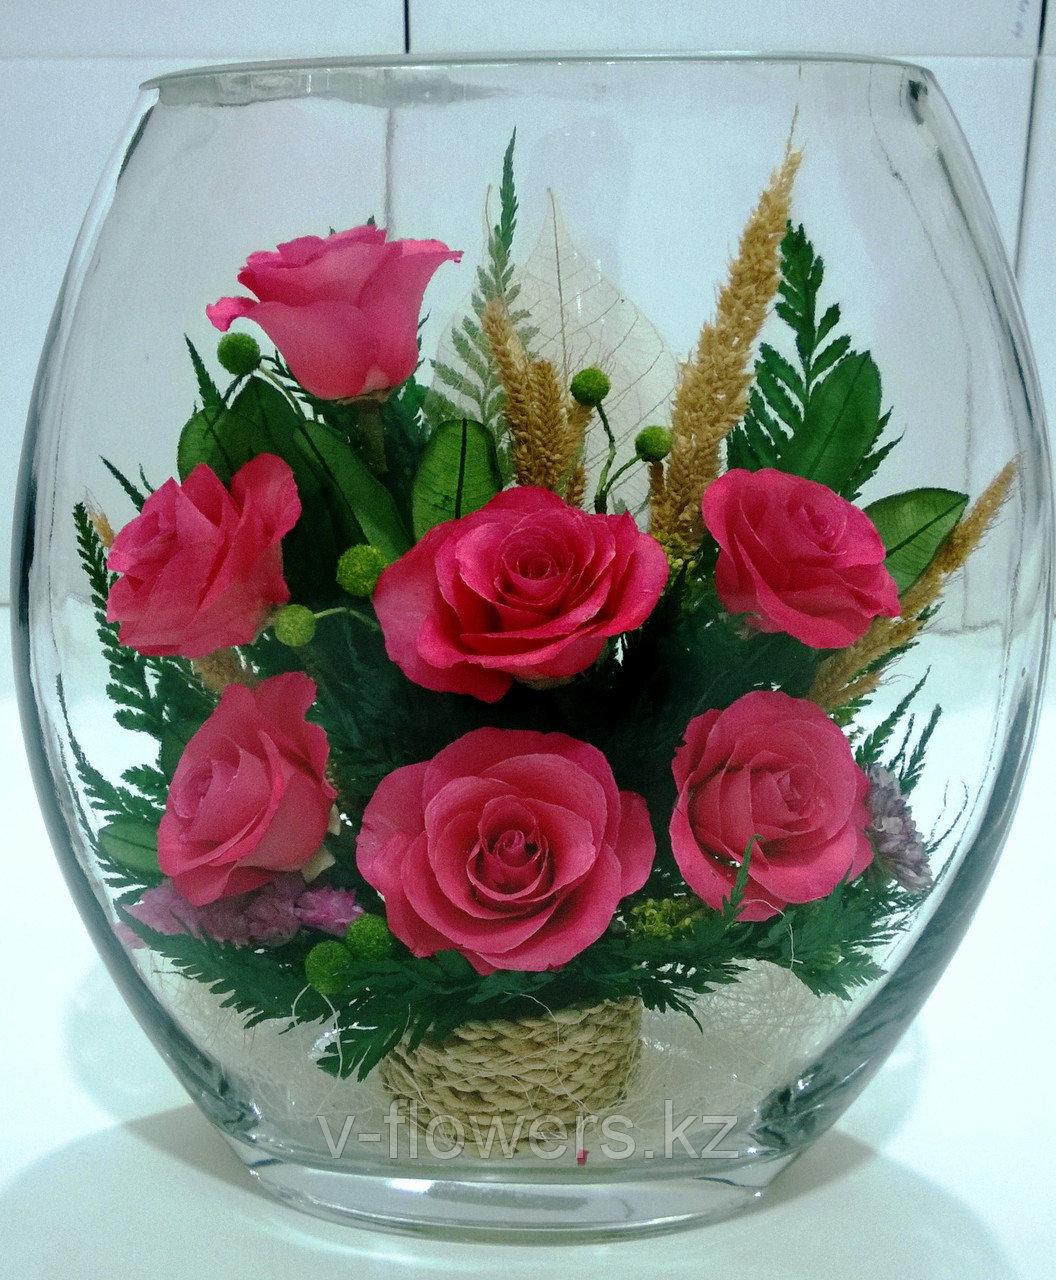 Цветы навсегда ERRp-03